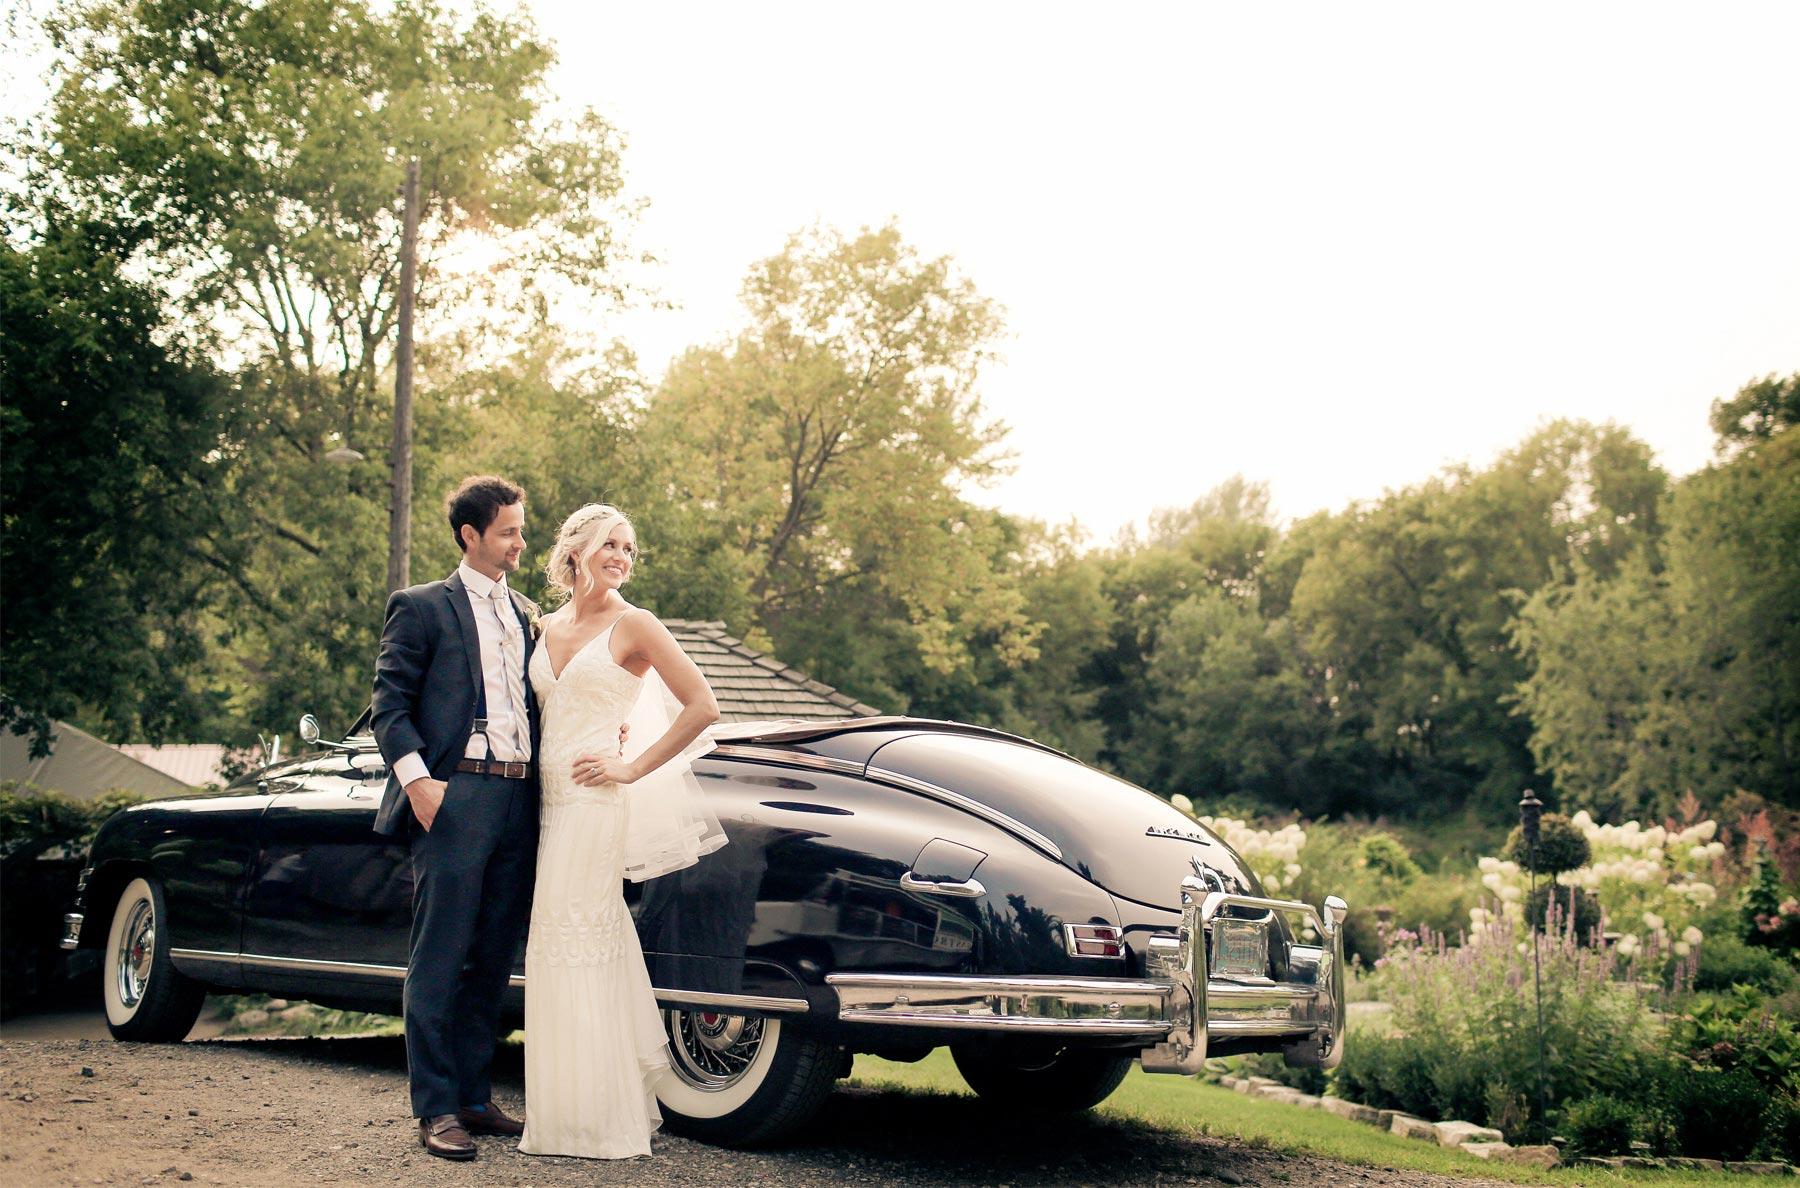 15-Stillwater-Minnesota-Wedding-Photography-by-Vick-Photography-Camrose-Hill-Rustic-Convertable-Garden-Tina-&-Eric.jpg